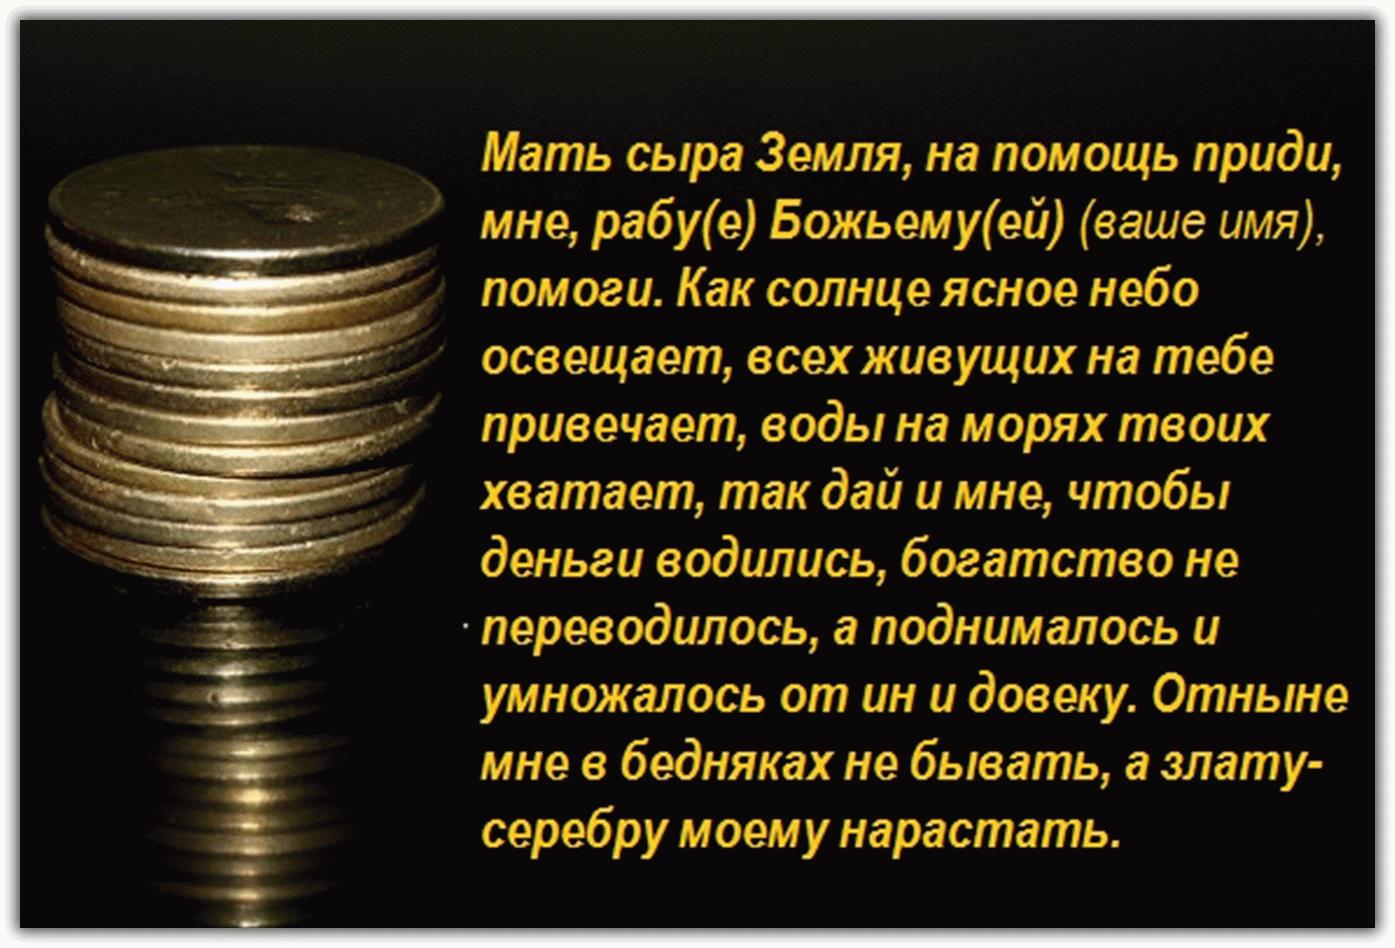 Заговор на мед чтоб деньги водились заговор на деньги по фазам луны